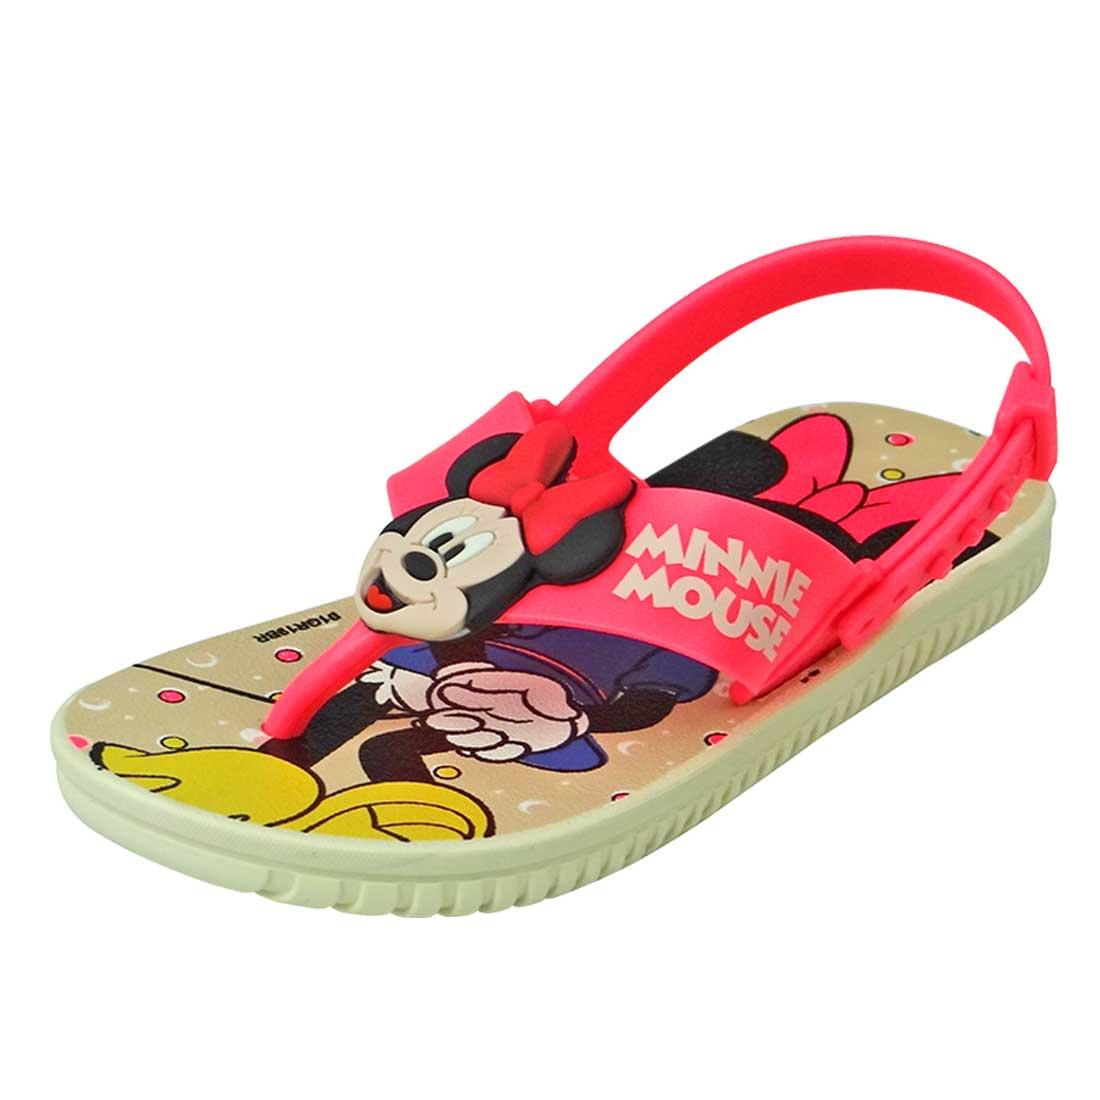 Sandália Baby Disney Friend Minnie Mouse - Bege e Rosa